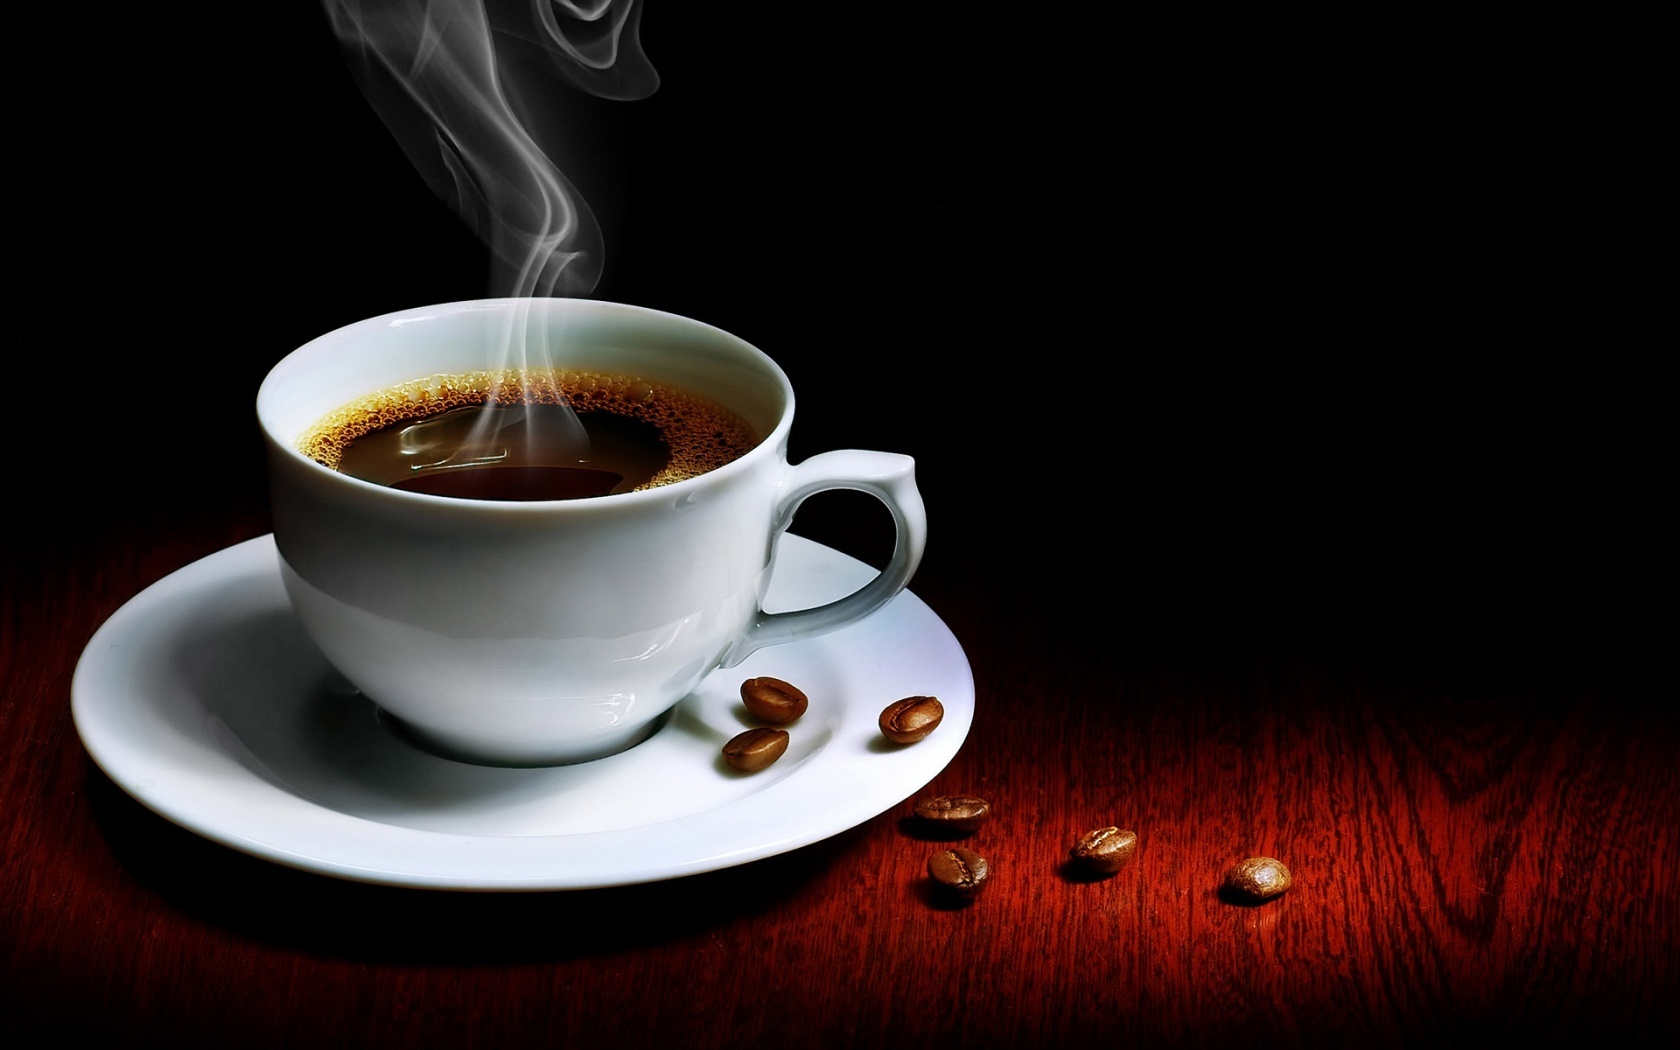 Cup of coffee   Coffee Photo 17731301 1680x1050